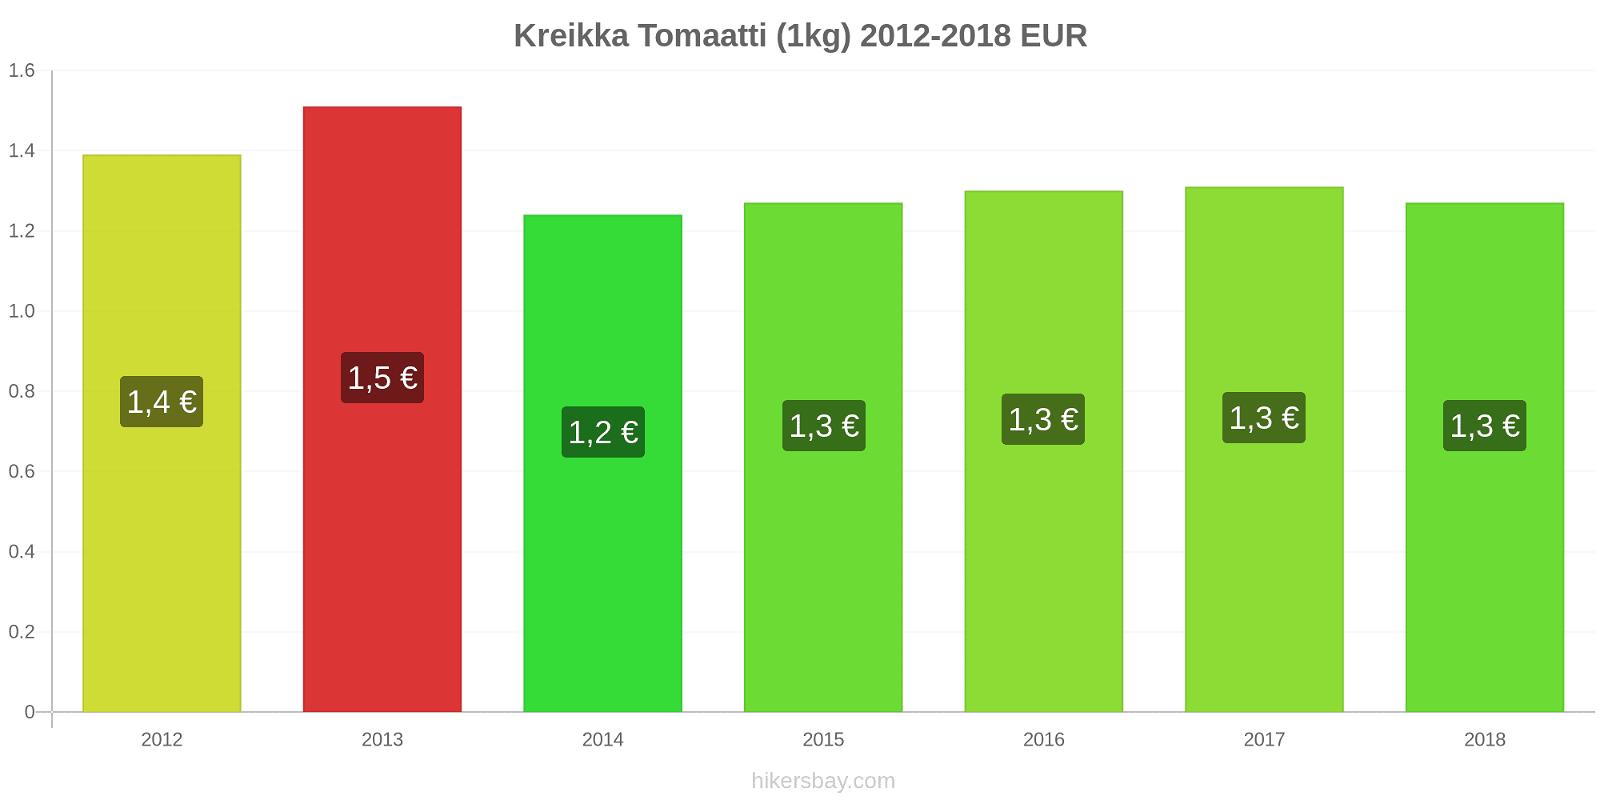 Kreikka hintojen muutokset Tomaatti (1kg) hikersbay.com